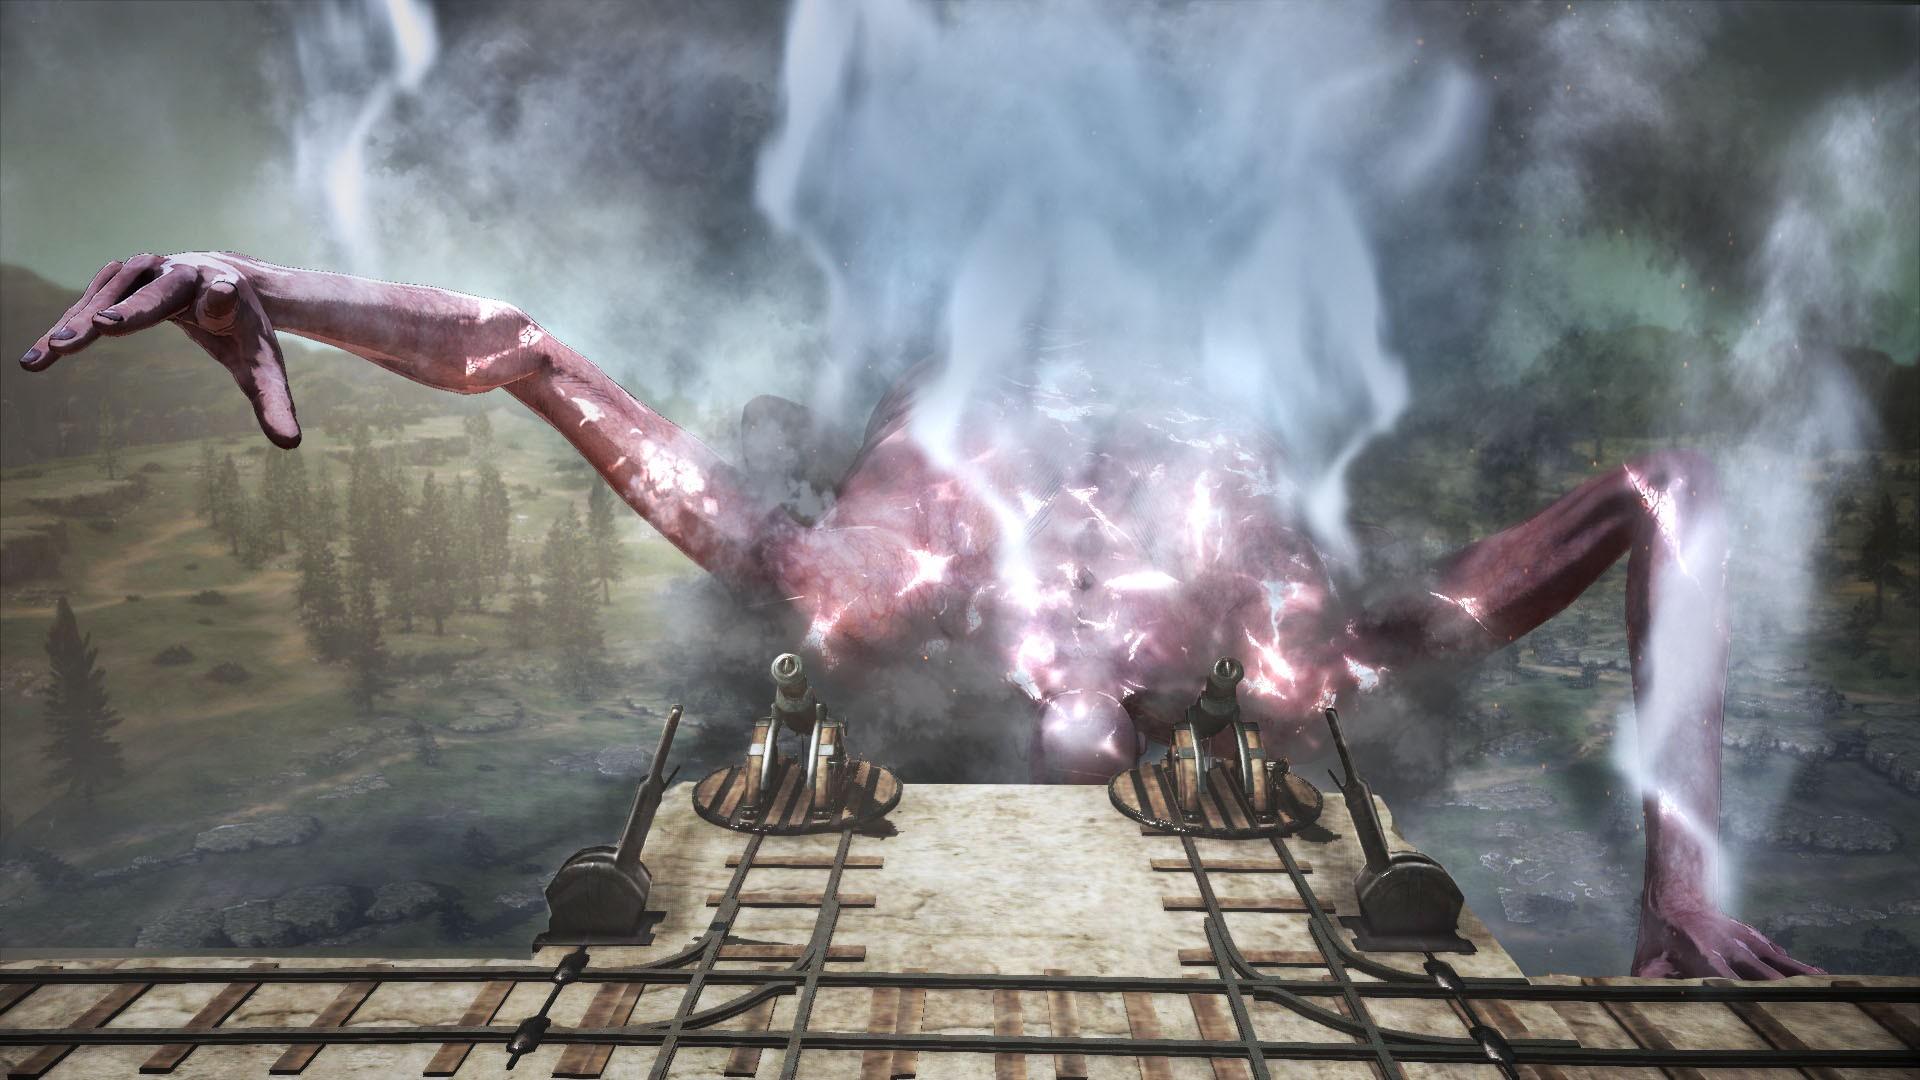 Attack On Titan 2 Final Battle Upgrade Pack Wallpaper 2 Atomix